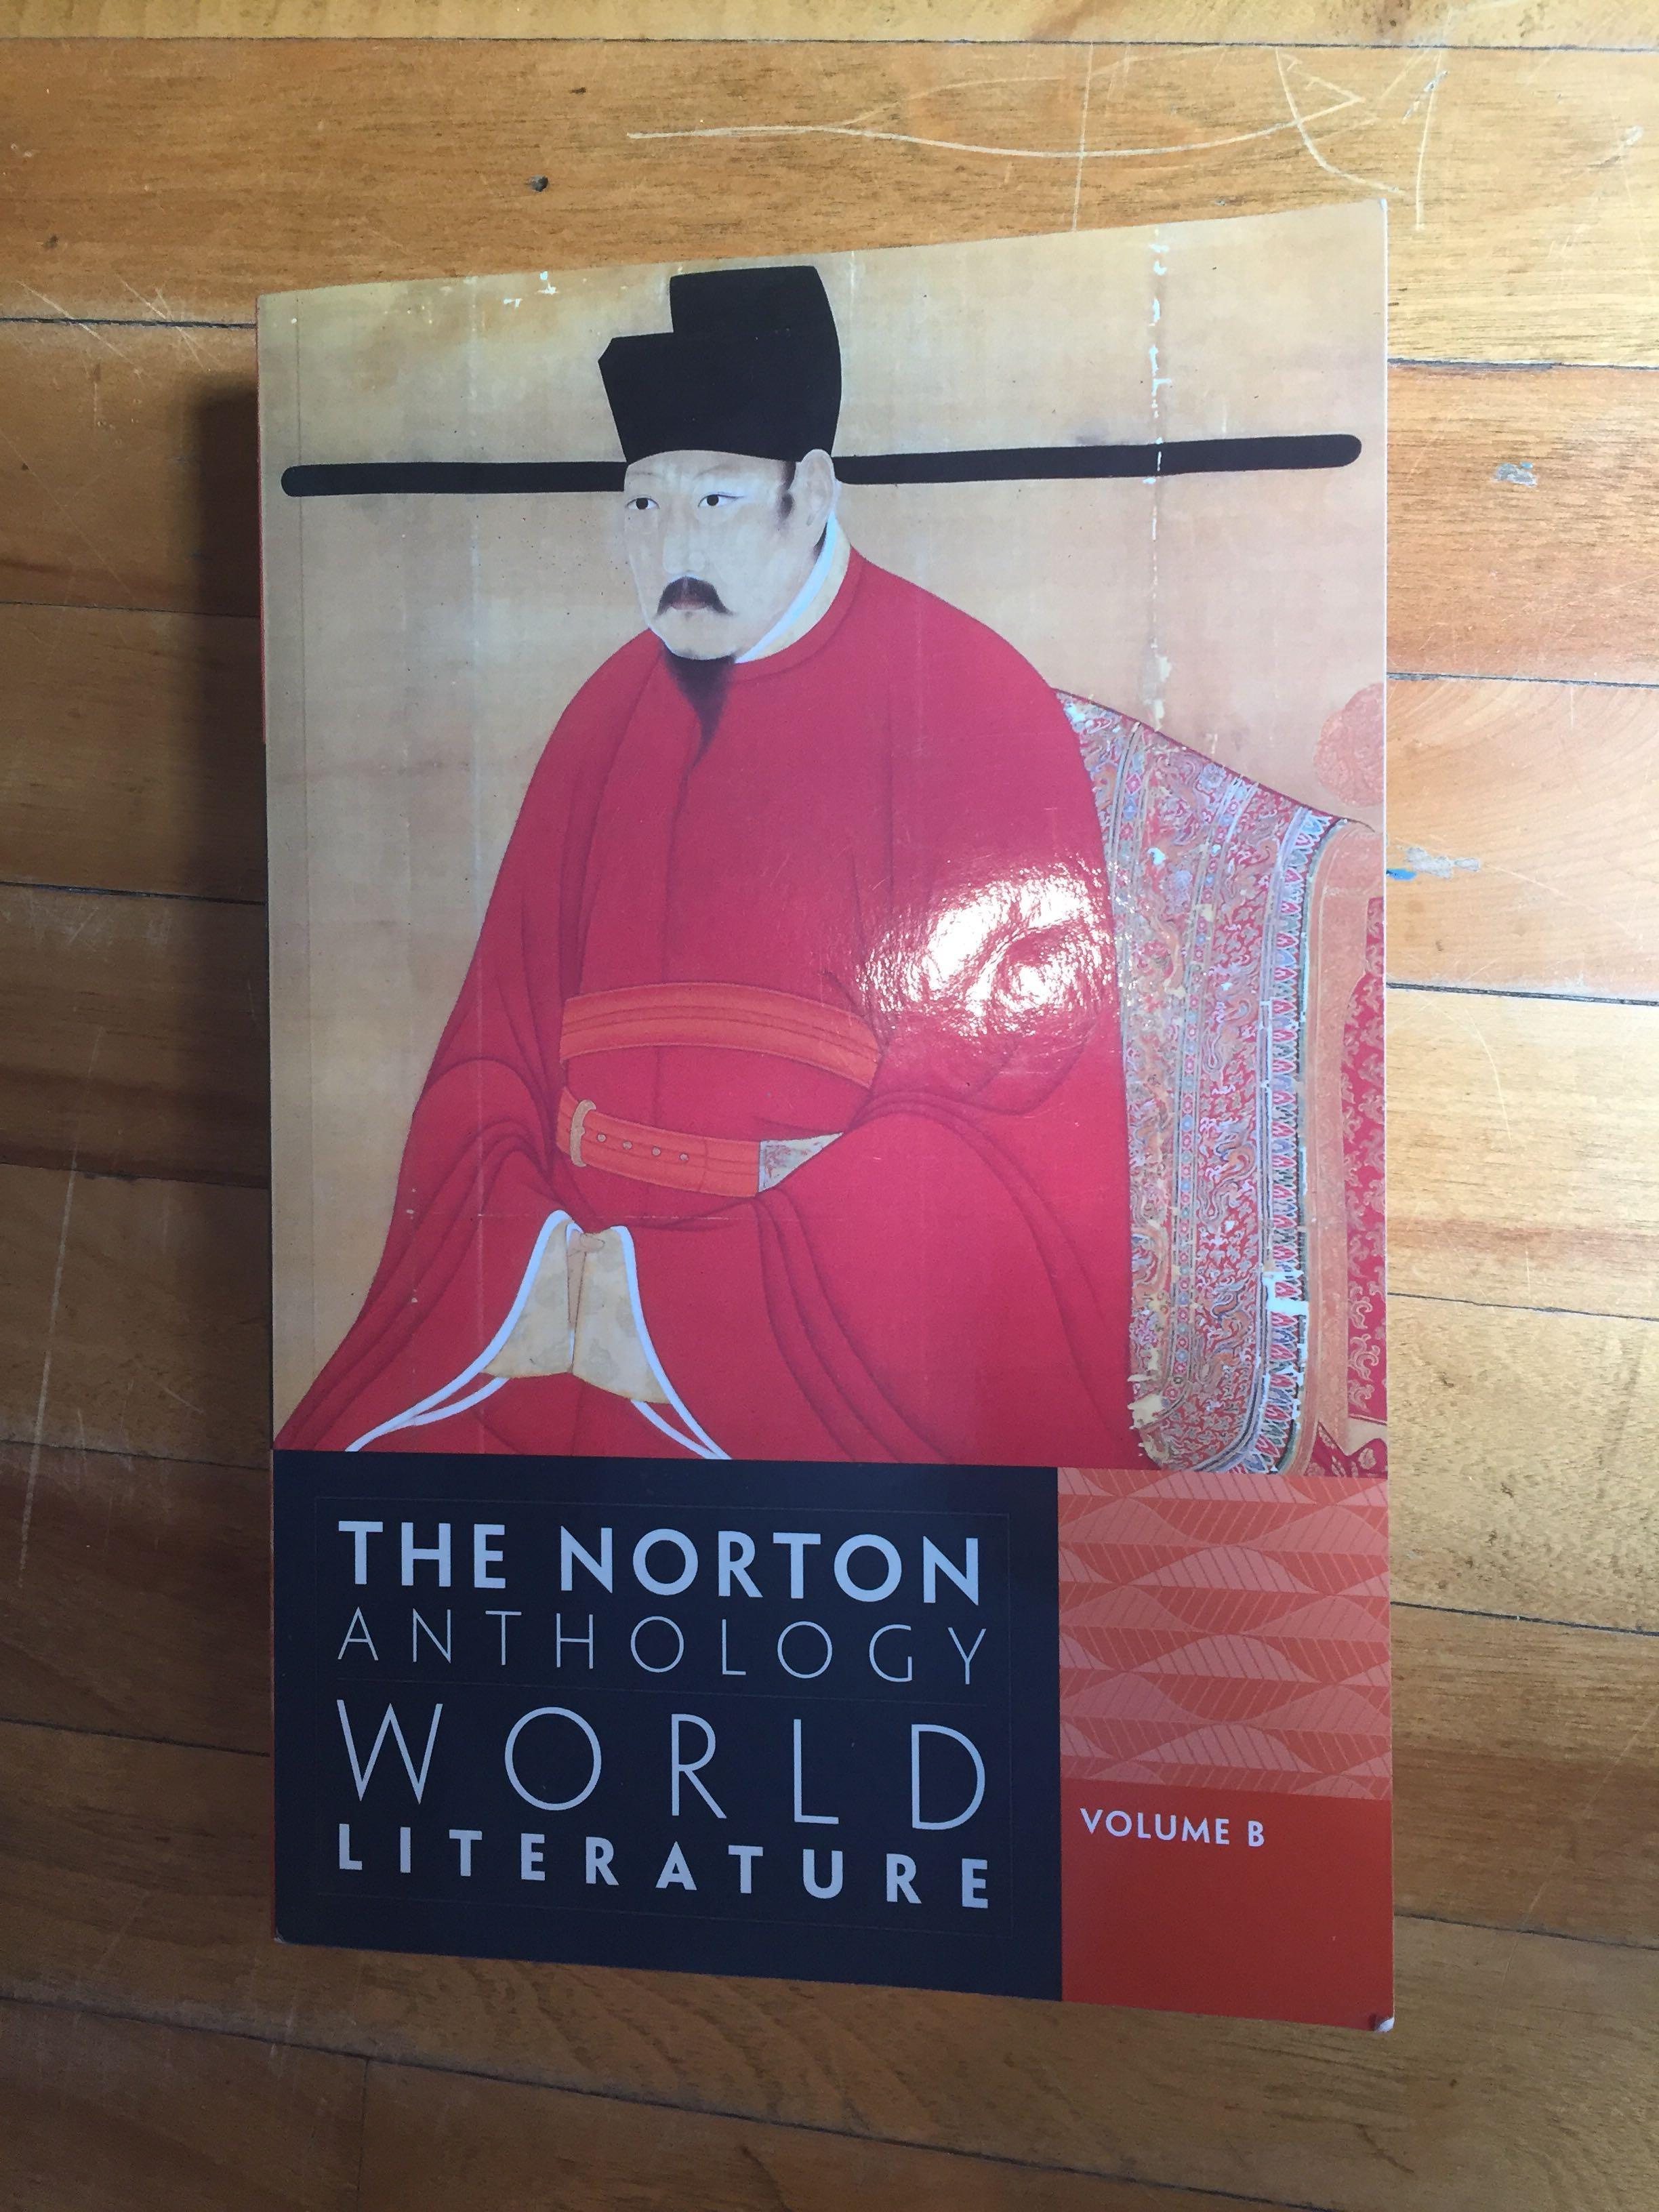 The norton anthology world literature volume B third edition